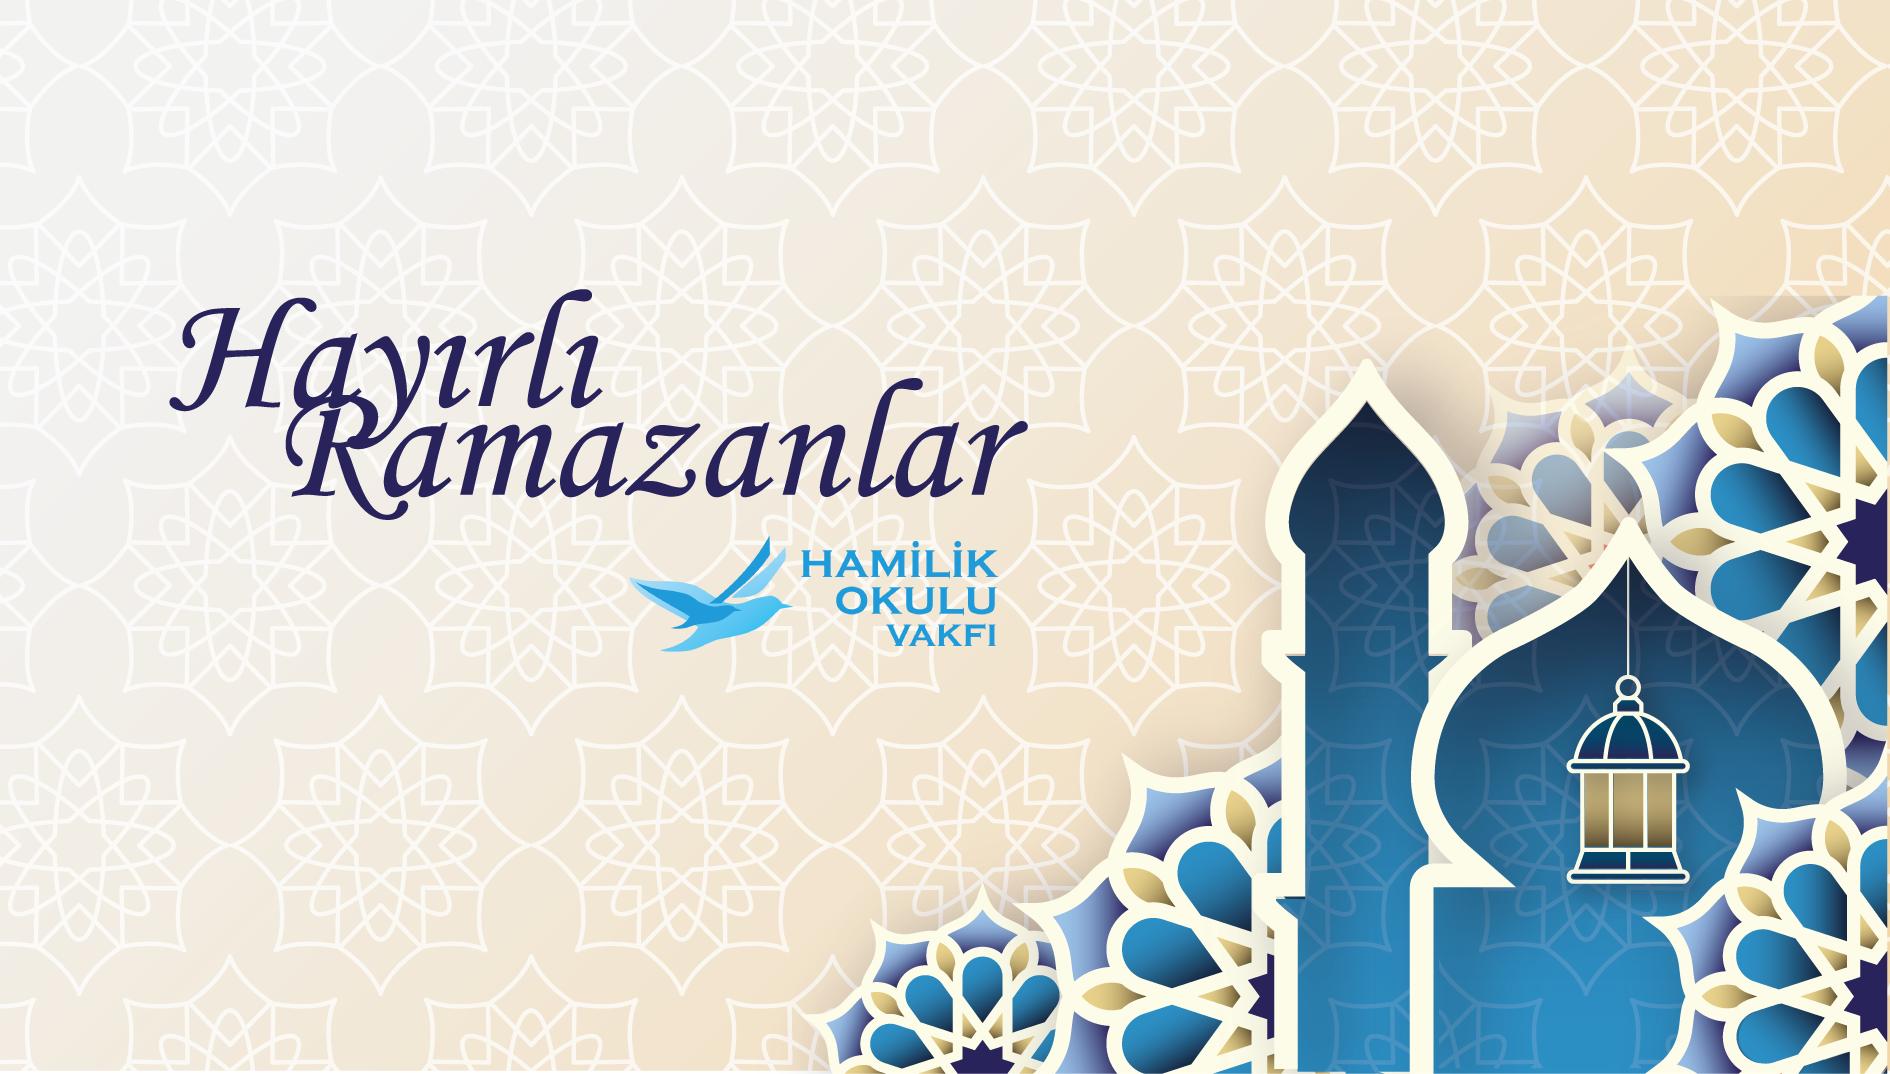 Hayırlı Ramazanlar! post thumbnail